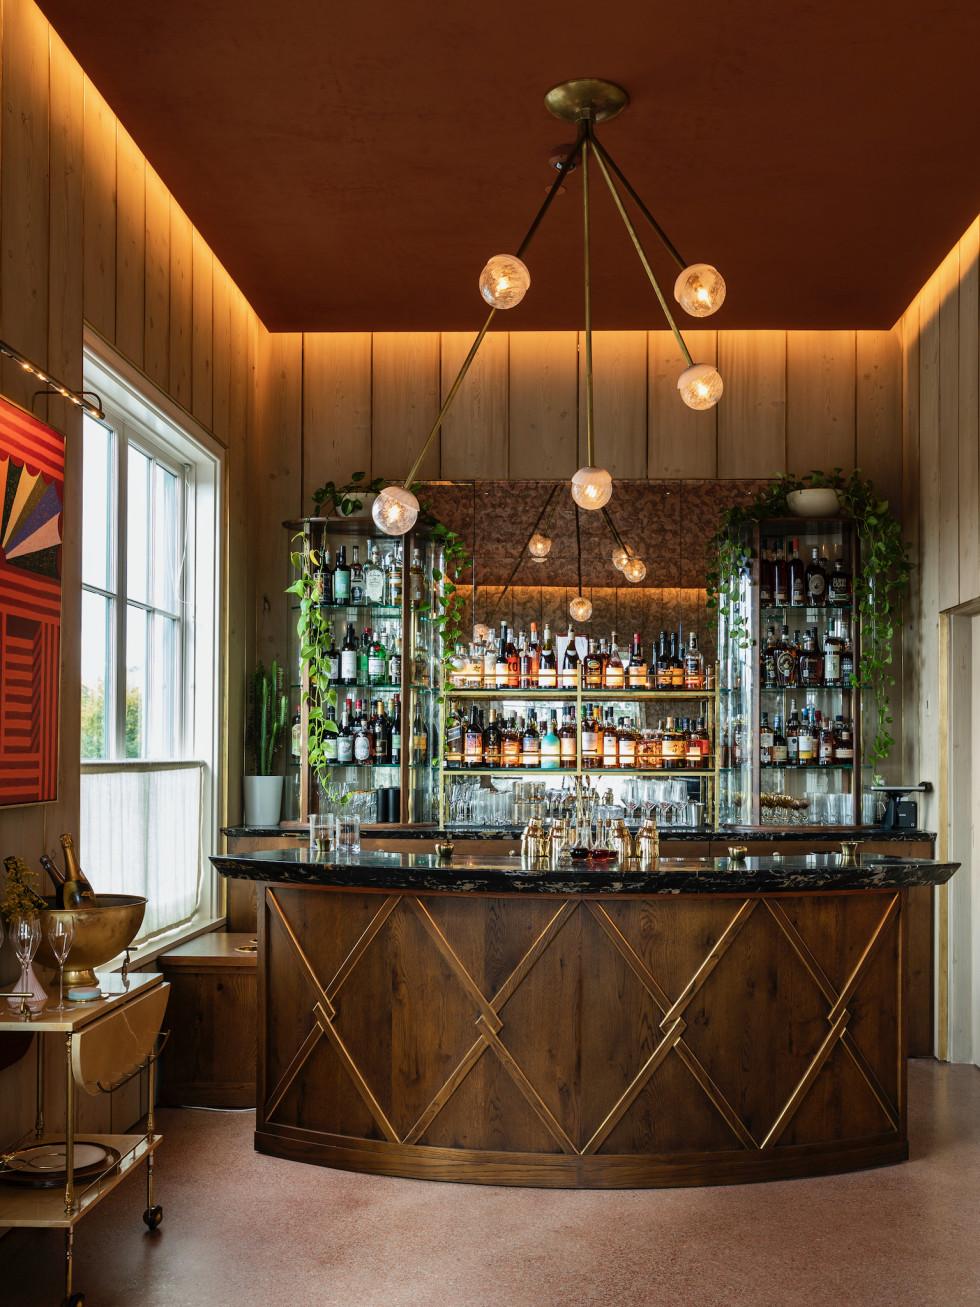 March restaurant bar interior